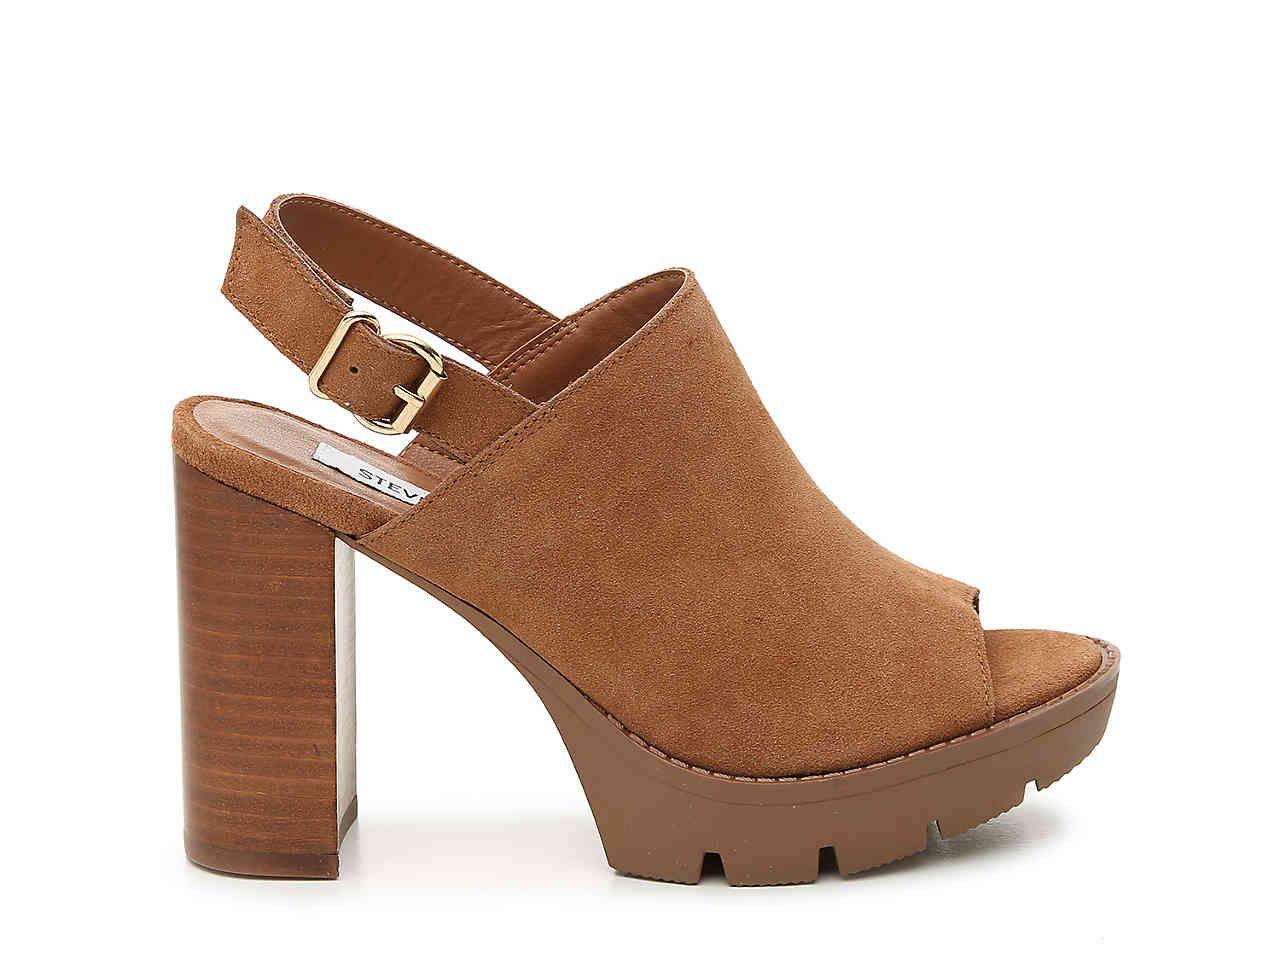 8c75dde48ba Steve Madden Minal Platform Sandal Women's Shoes | DSW | Style in ...